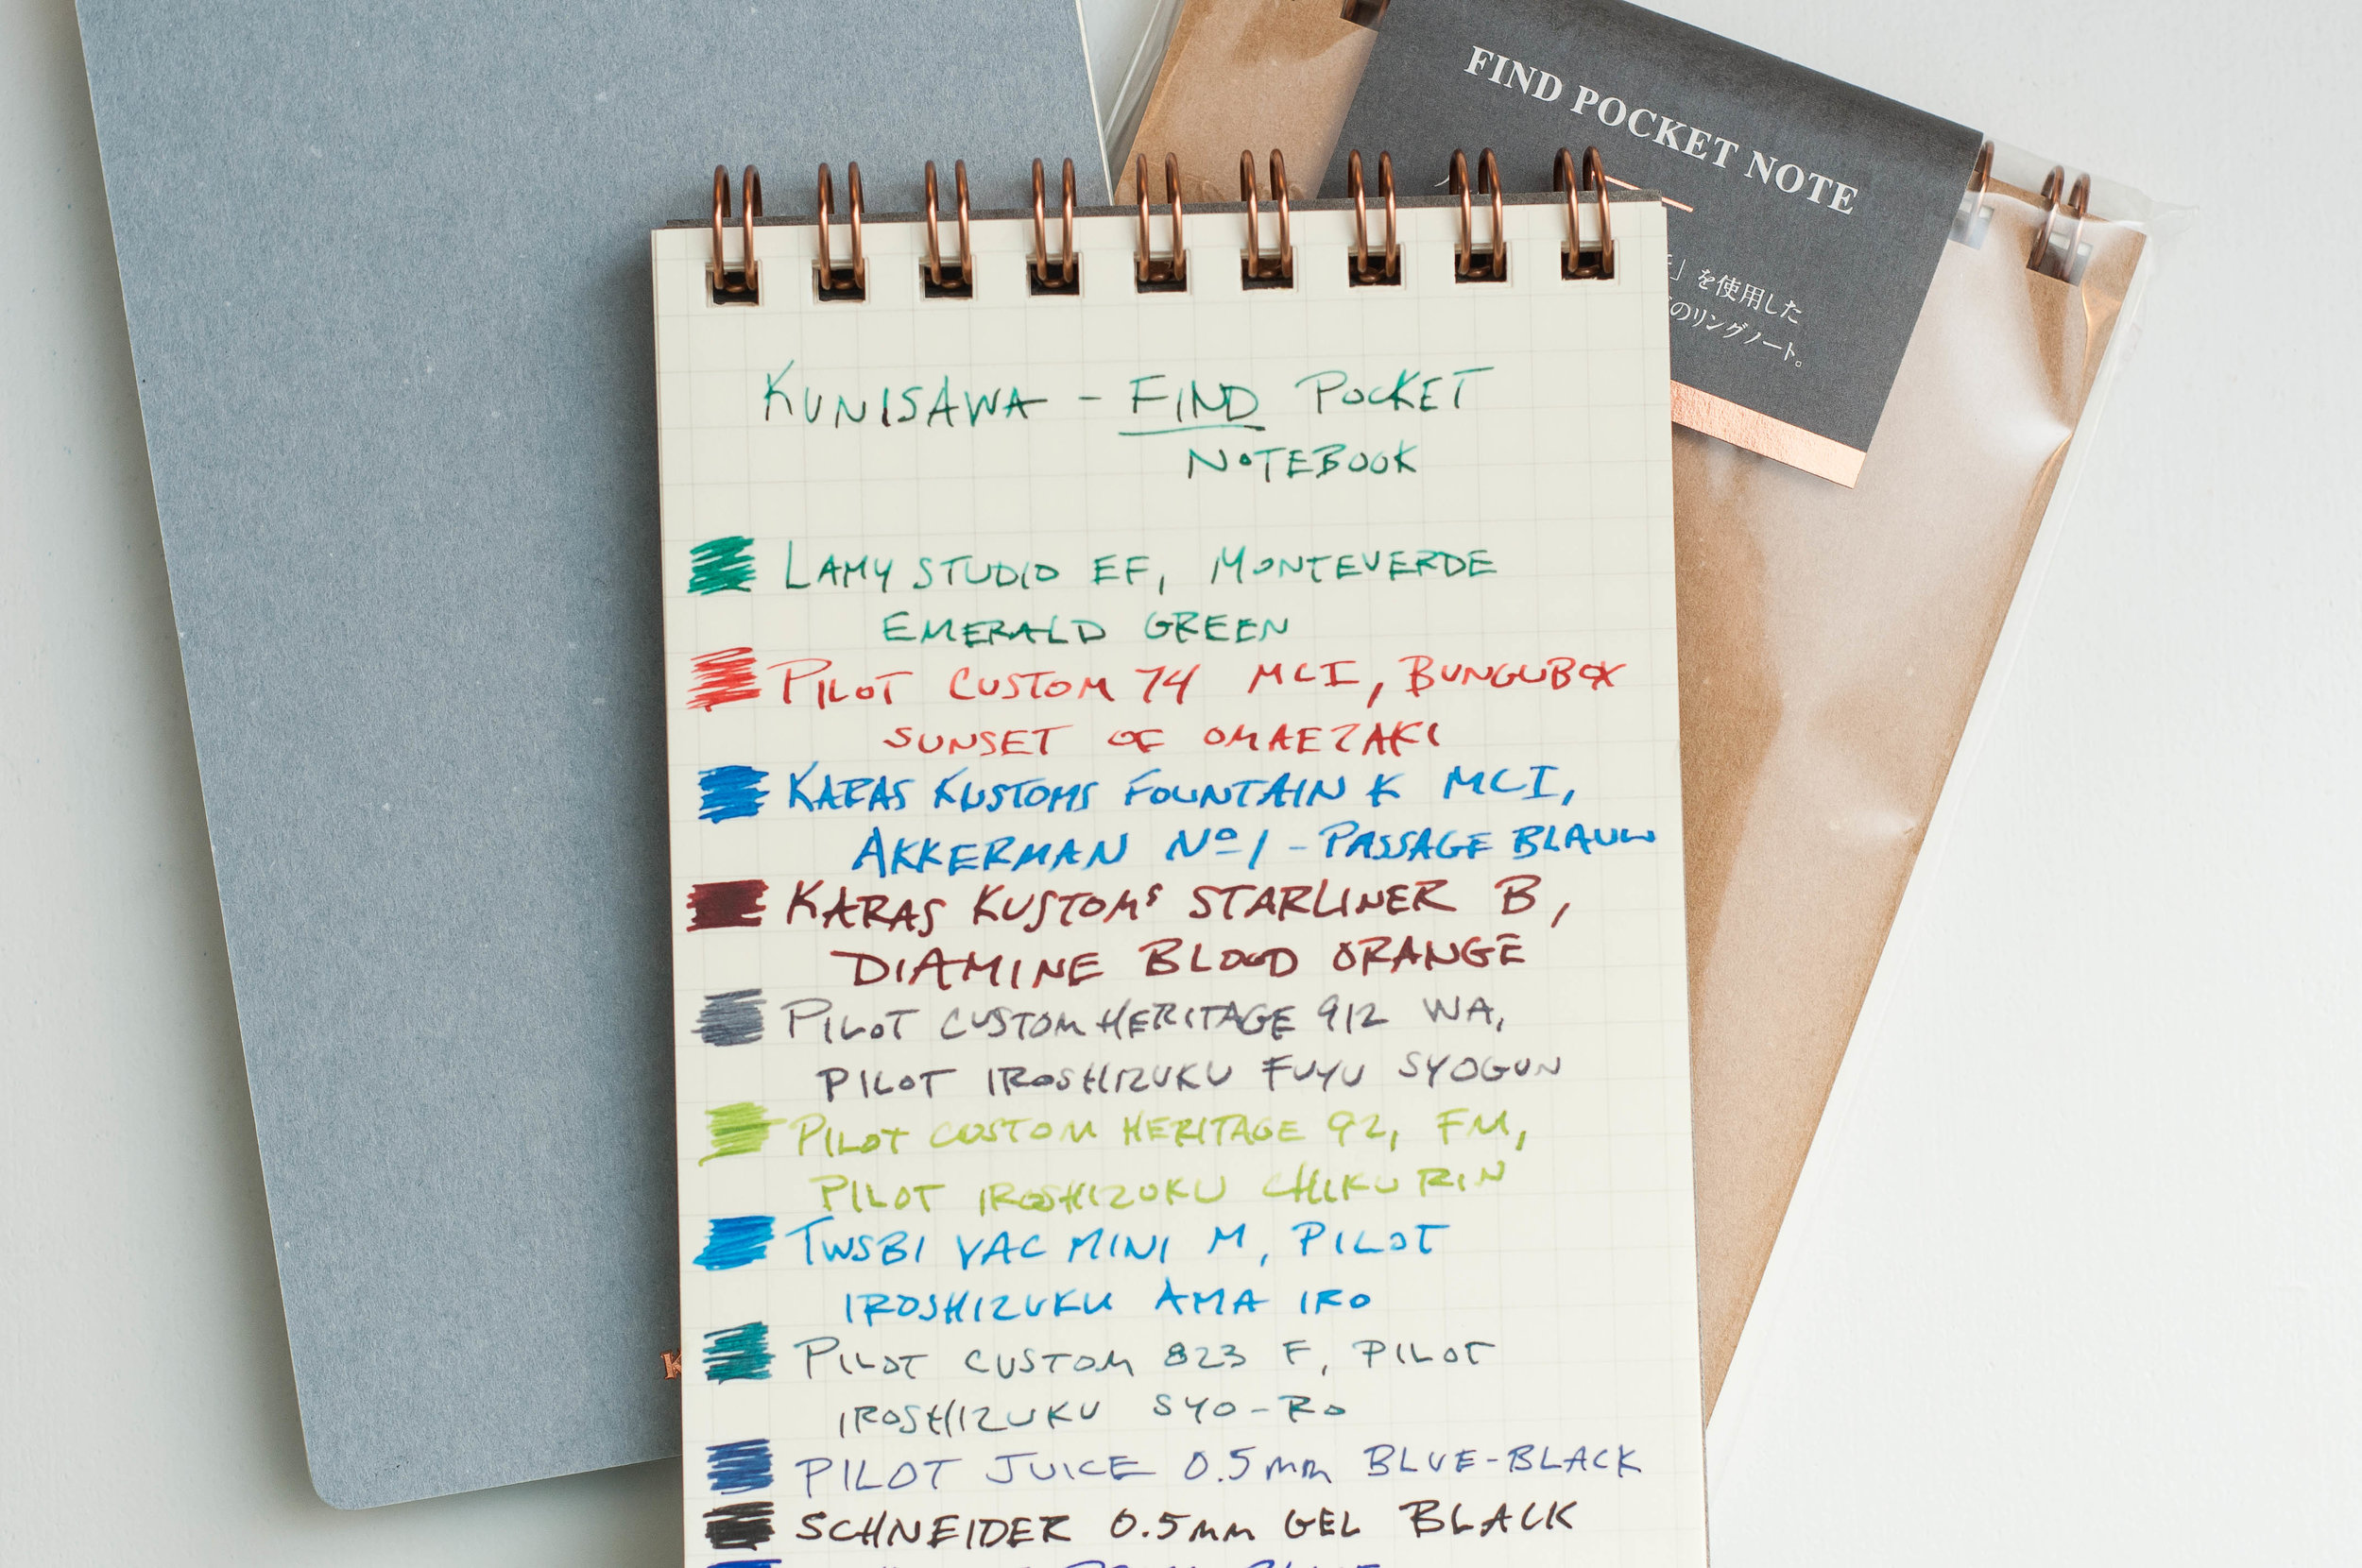 Kunisawa Find Pocket Notebook Writing